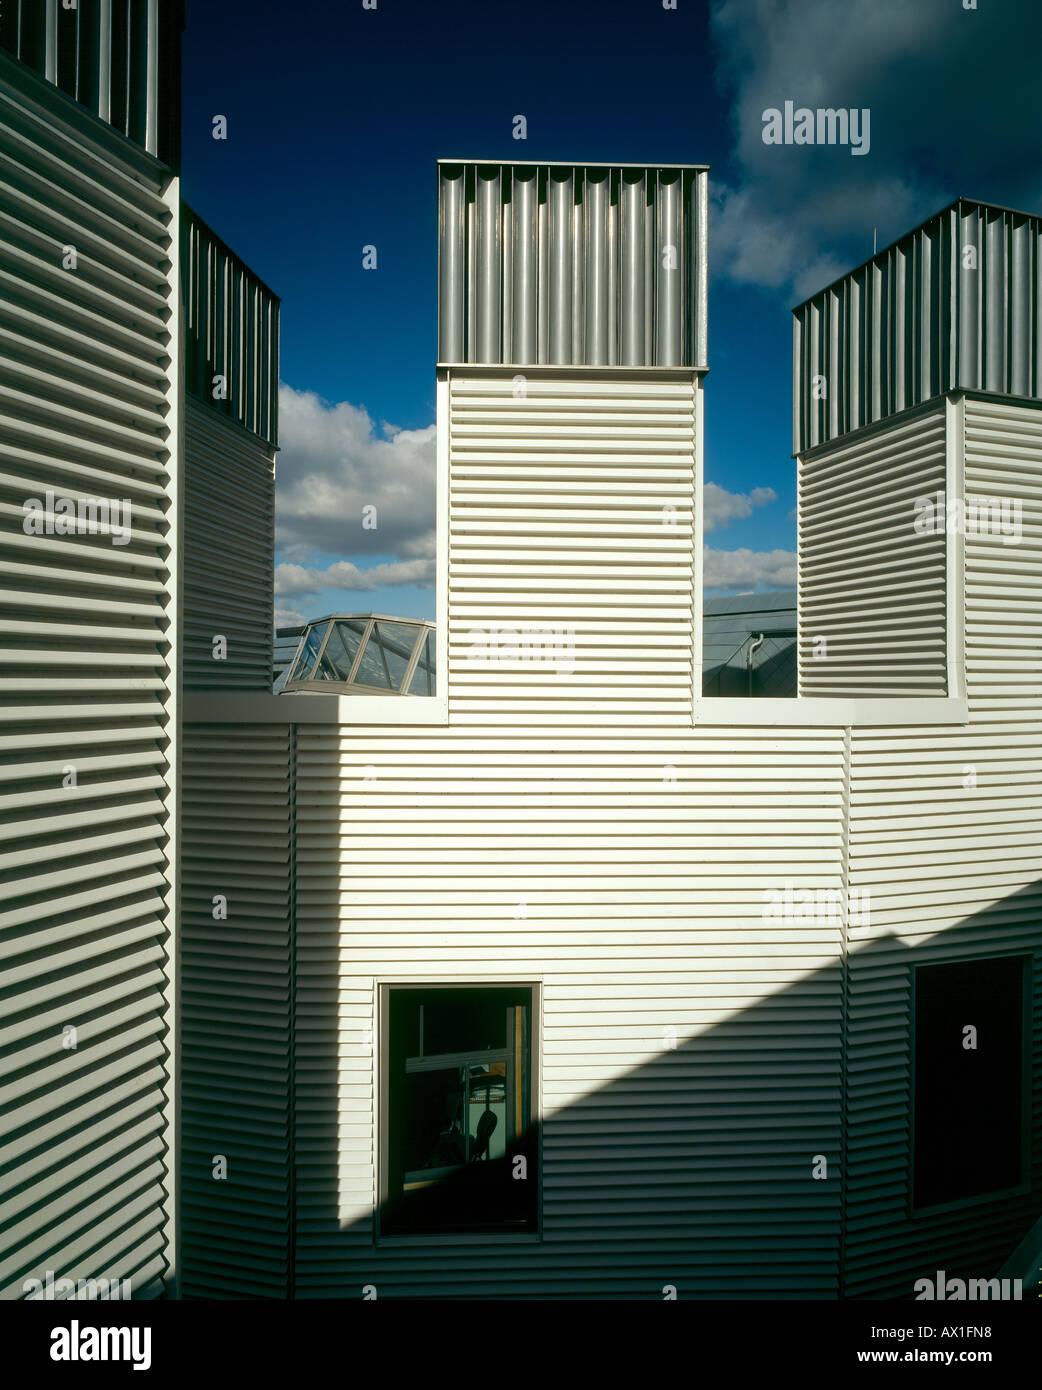 SCHOOL OF SLAVONIC AND EAST EUROPEAN STUDIES, LONDON, UK - Stock Image